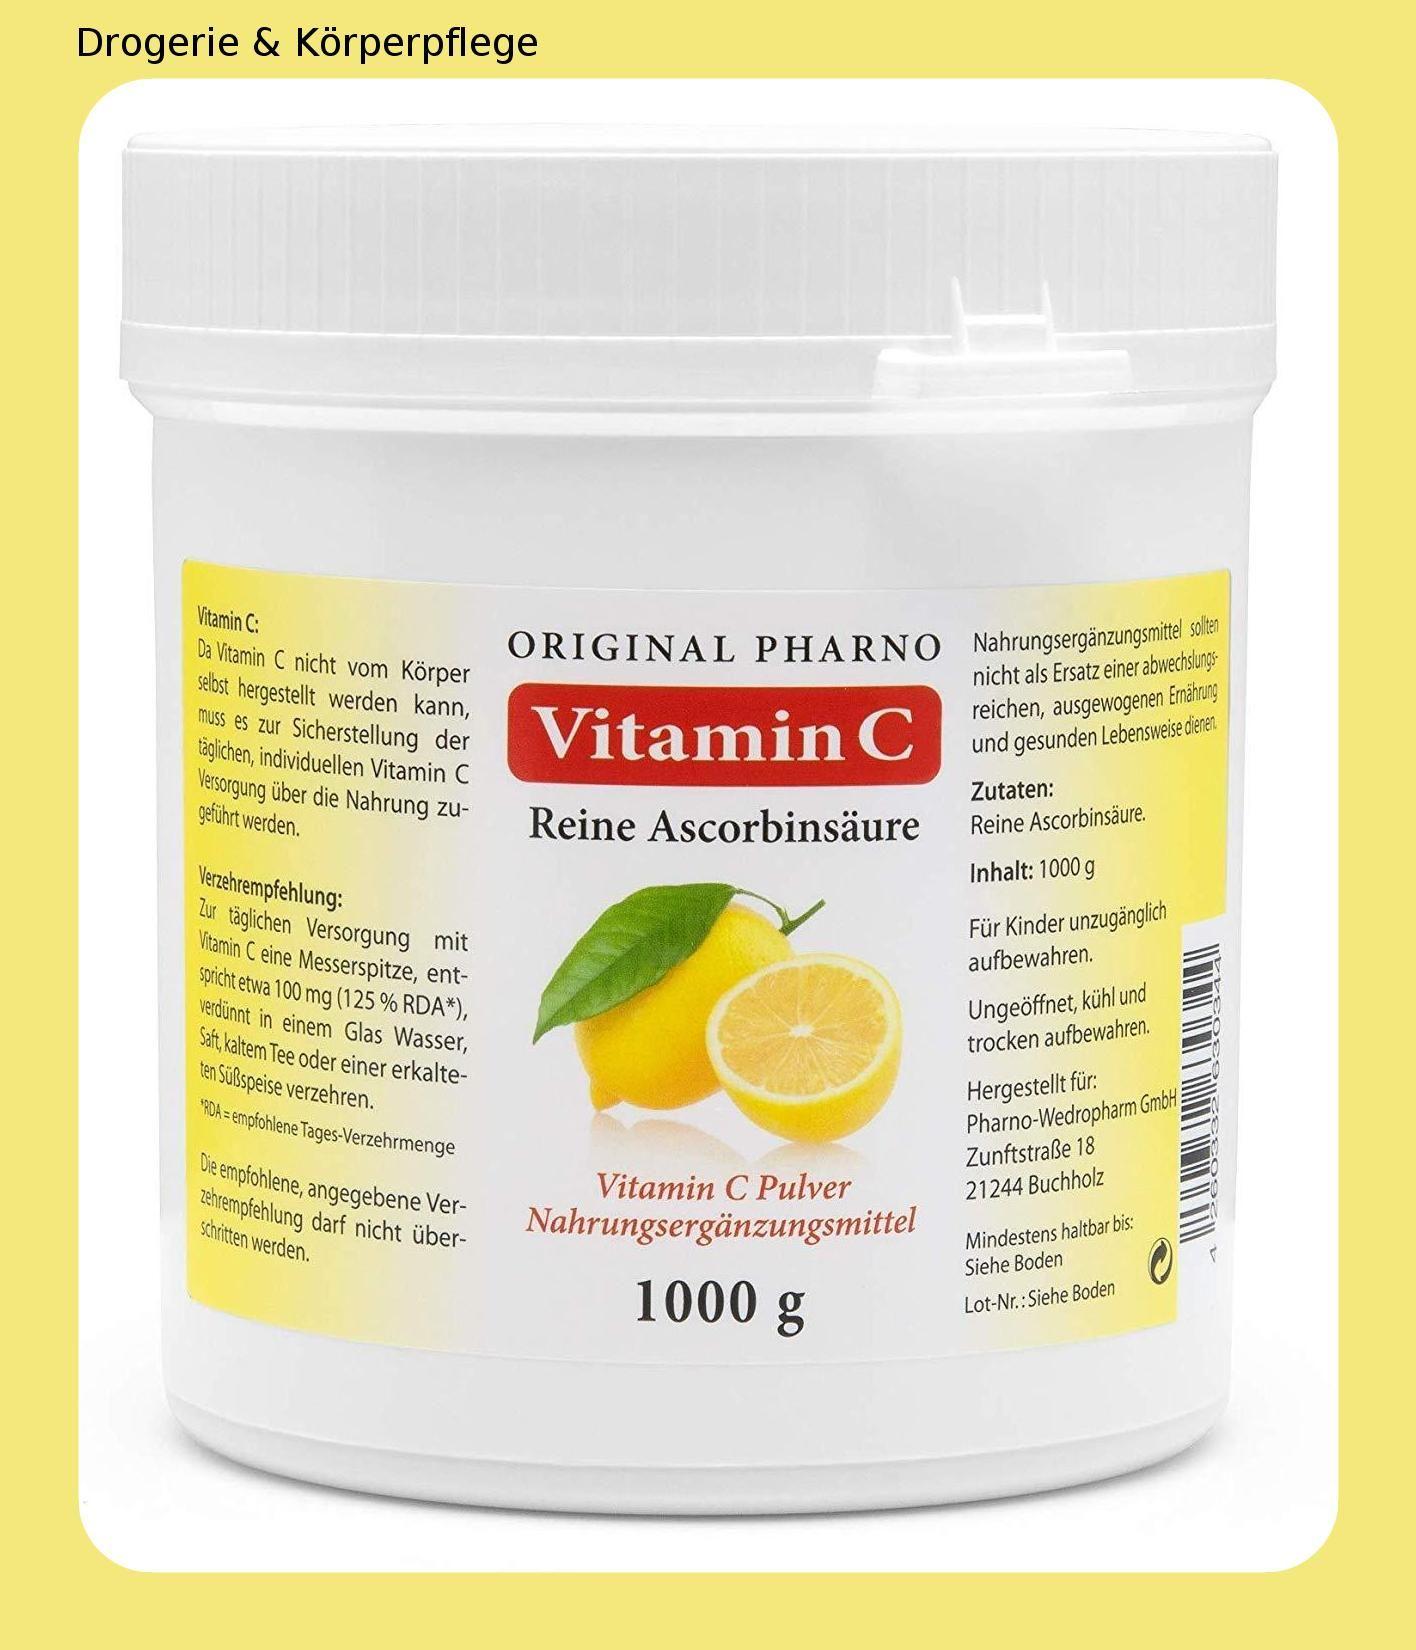 Vitamin C Reine Ascorbinsaure Apotheken Qualitat 1 Kg 1 Dose